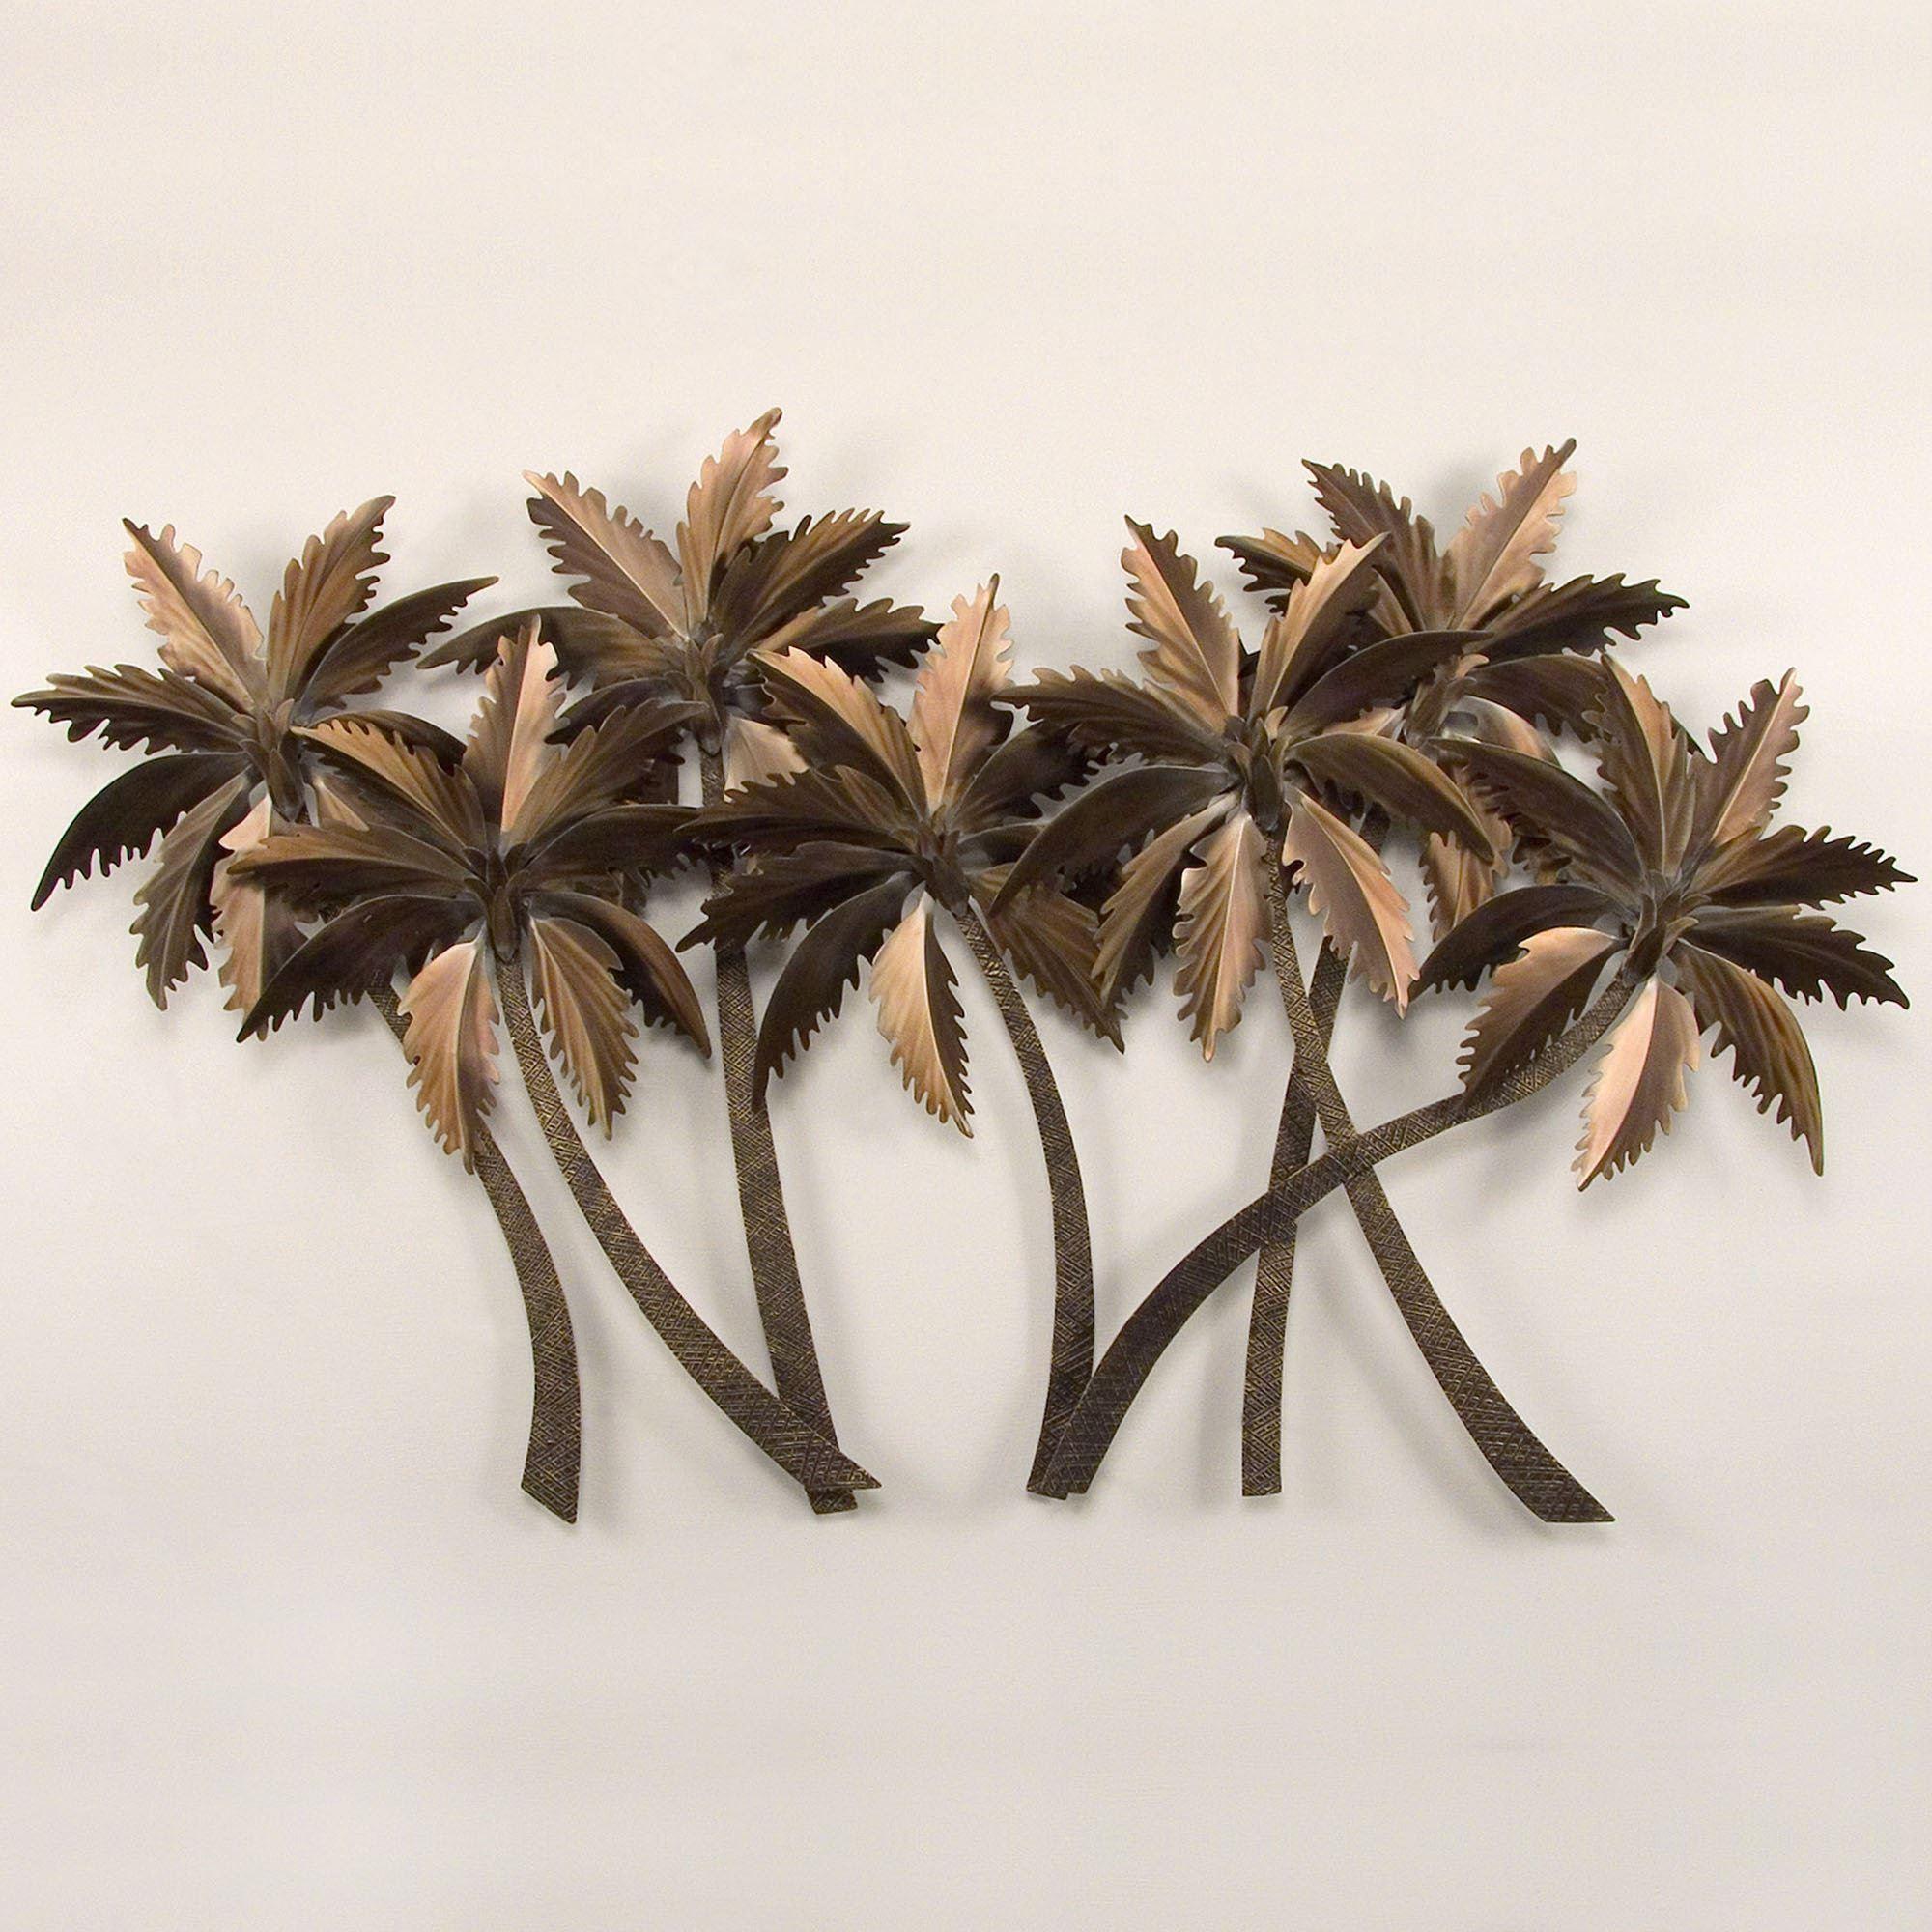 Tropical Palm Grove Metal Wall Sculpture Inside Palm Tree Metal Wall Art (Image 16 of 20)